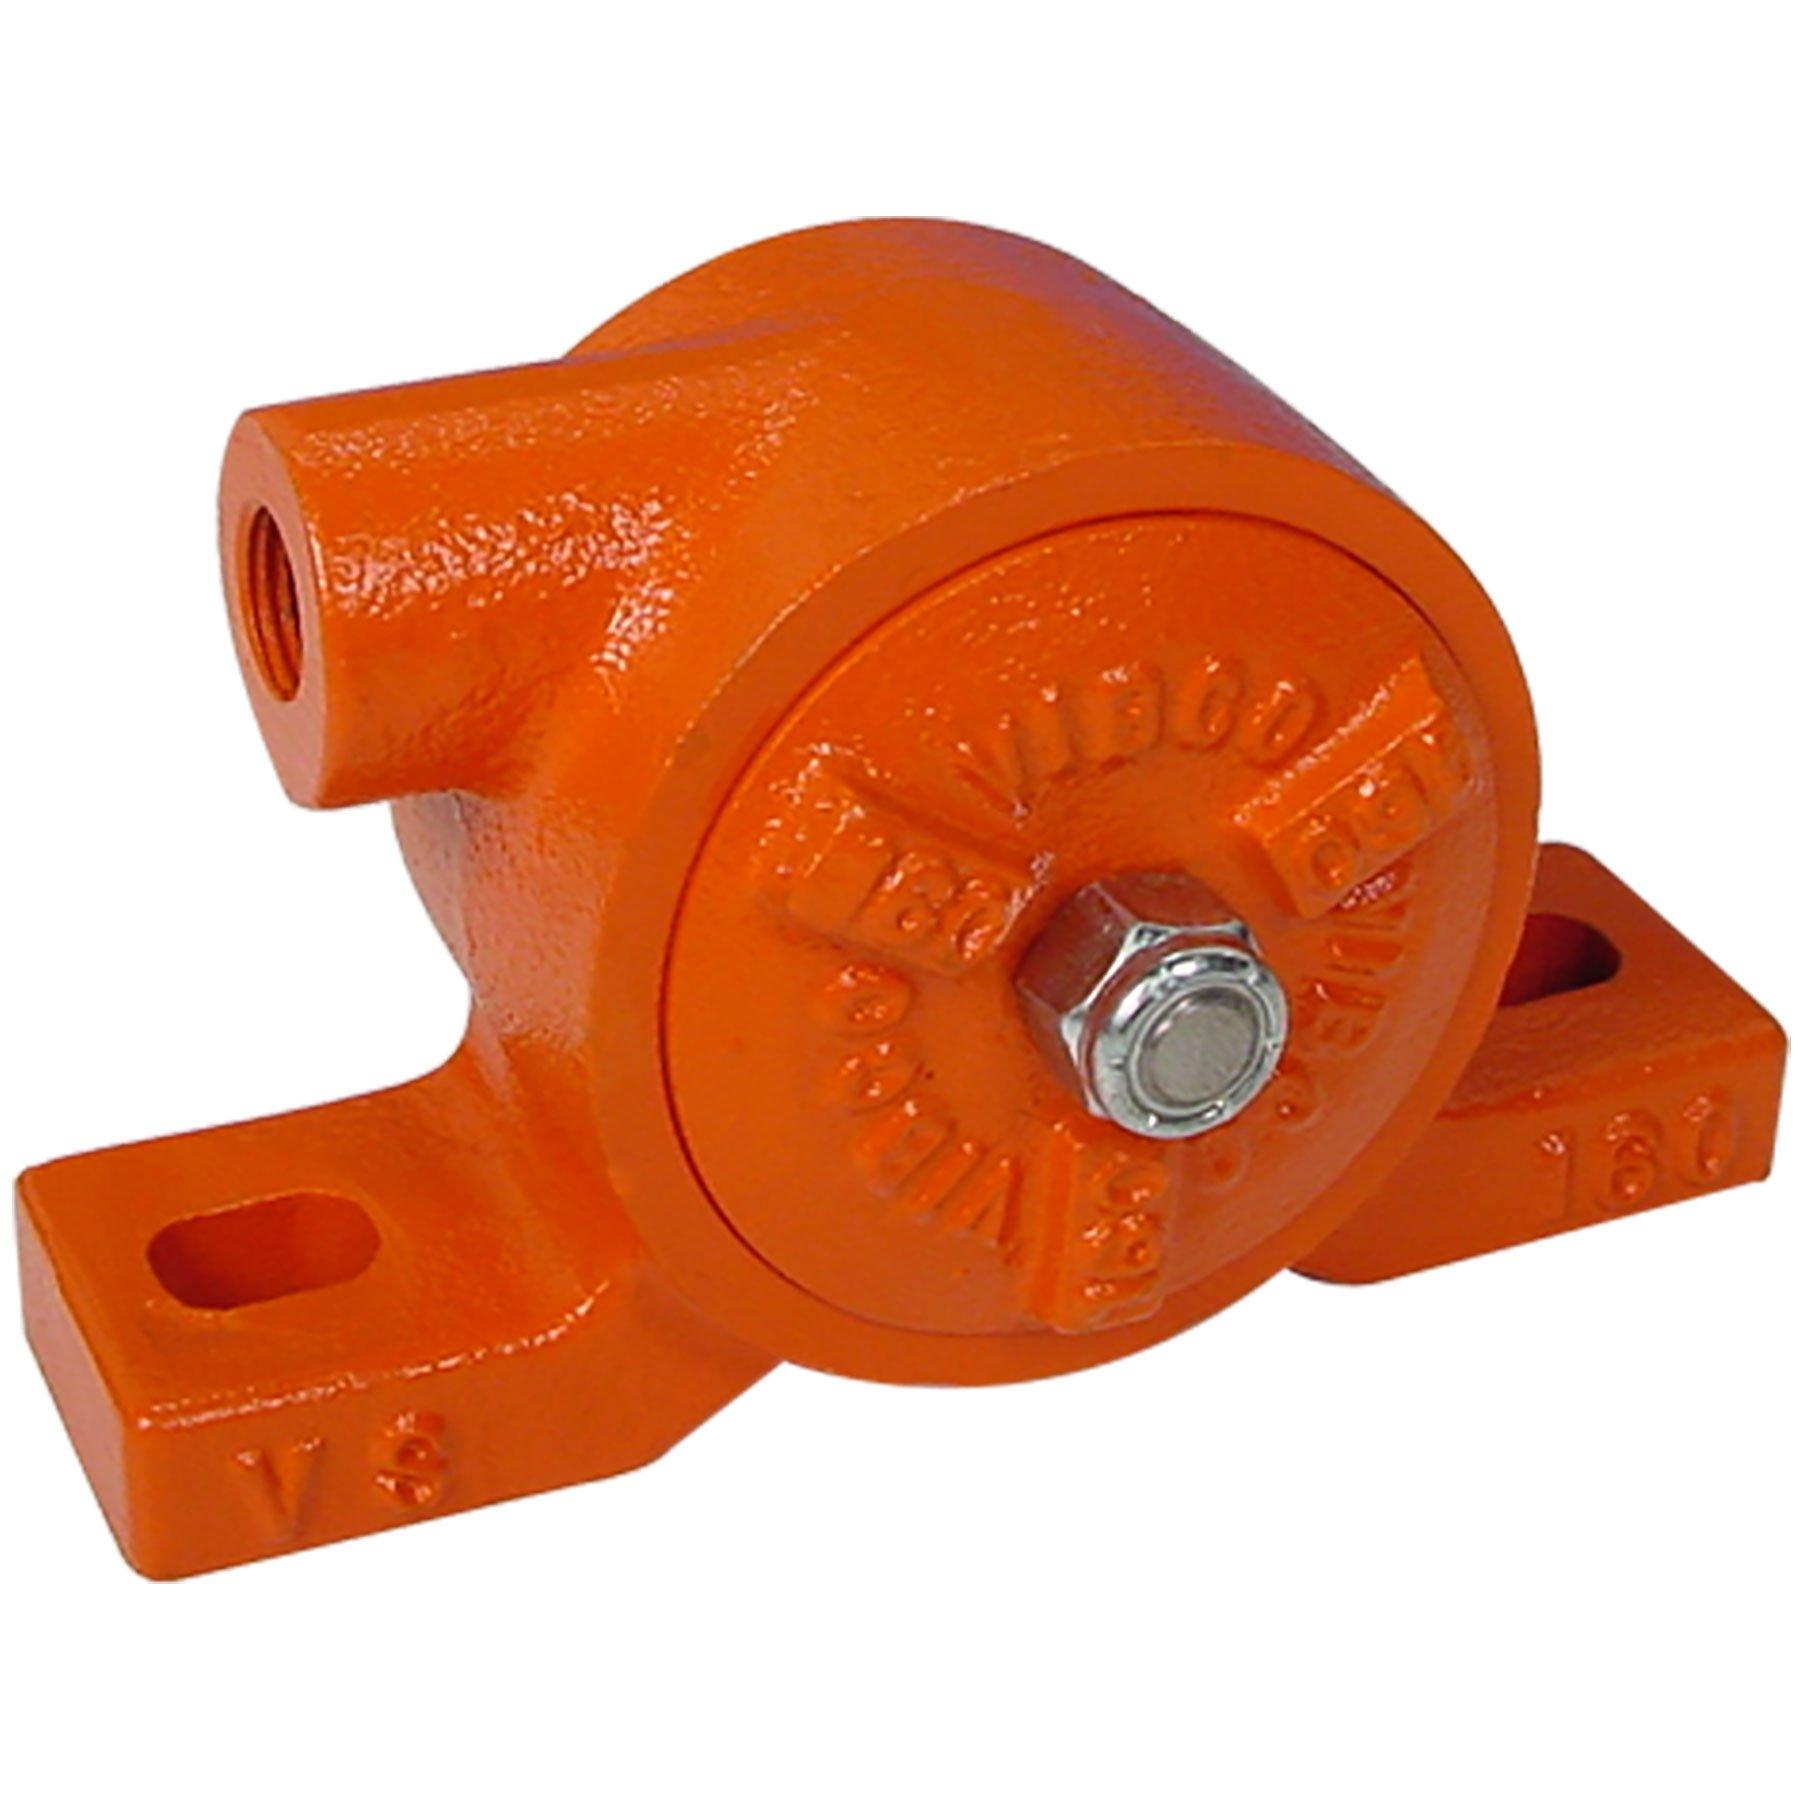 Pneumatic Vibrator, 160Lb, 10, 000Vpm, 80Psi by Vibco